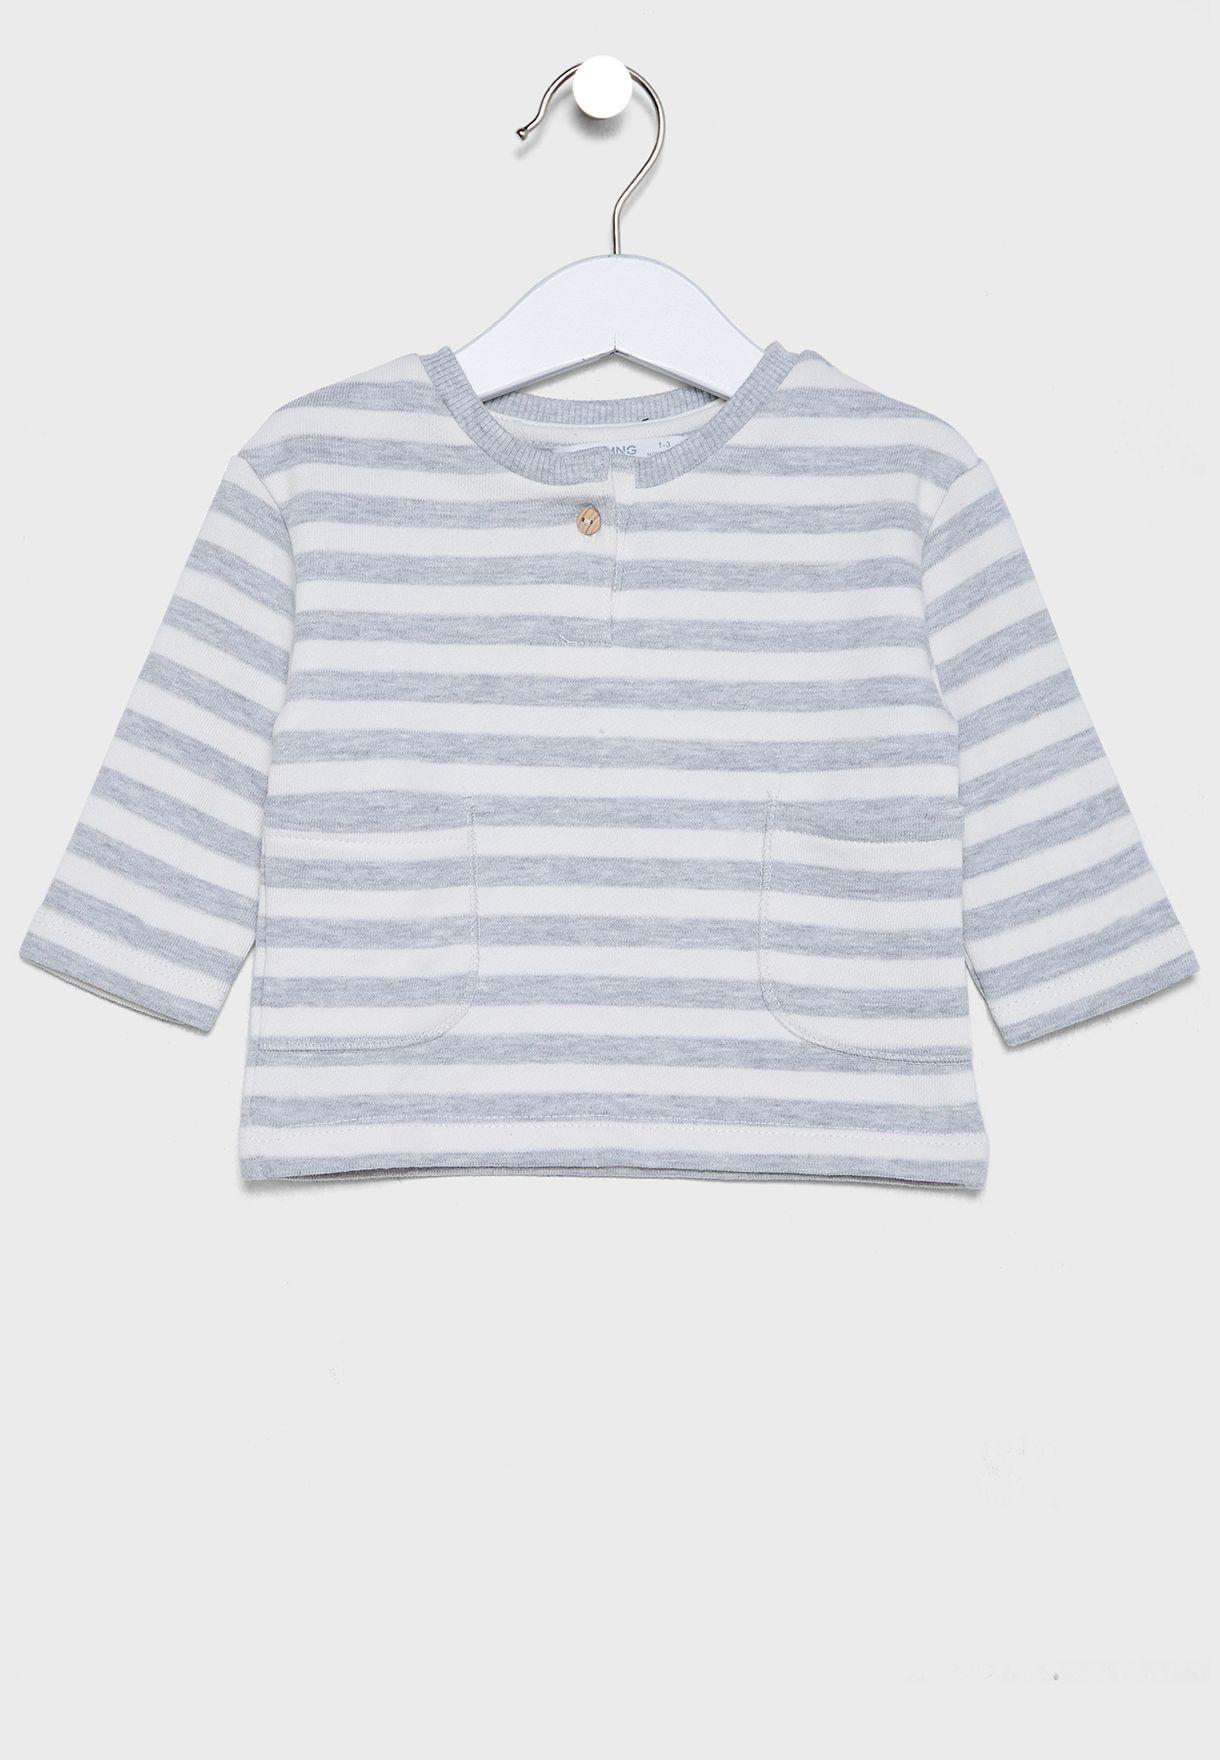 Infant Striped Sweatshirt